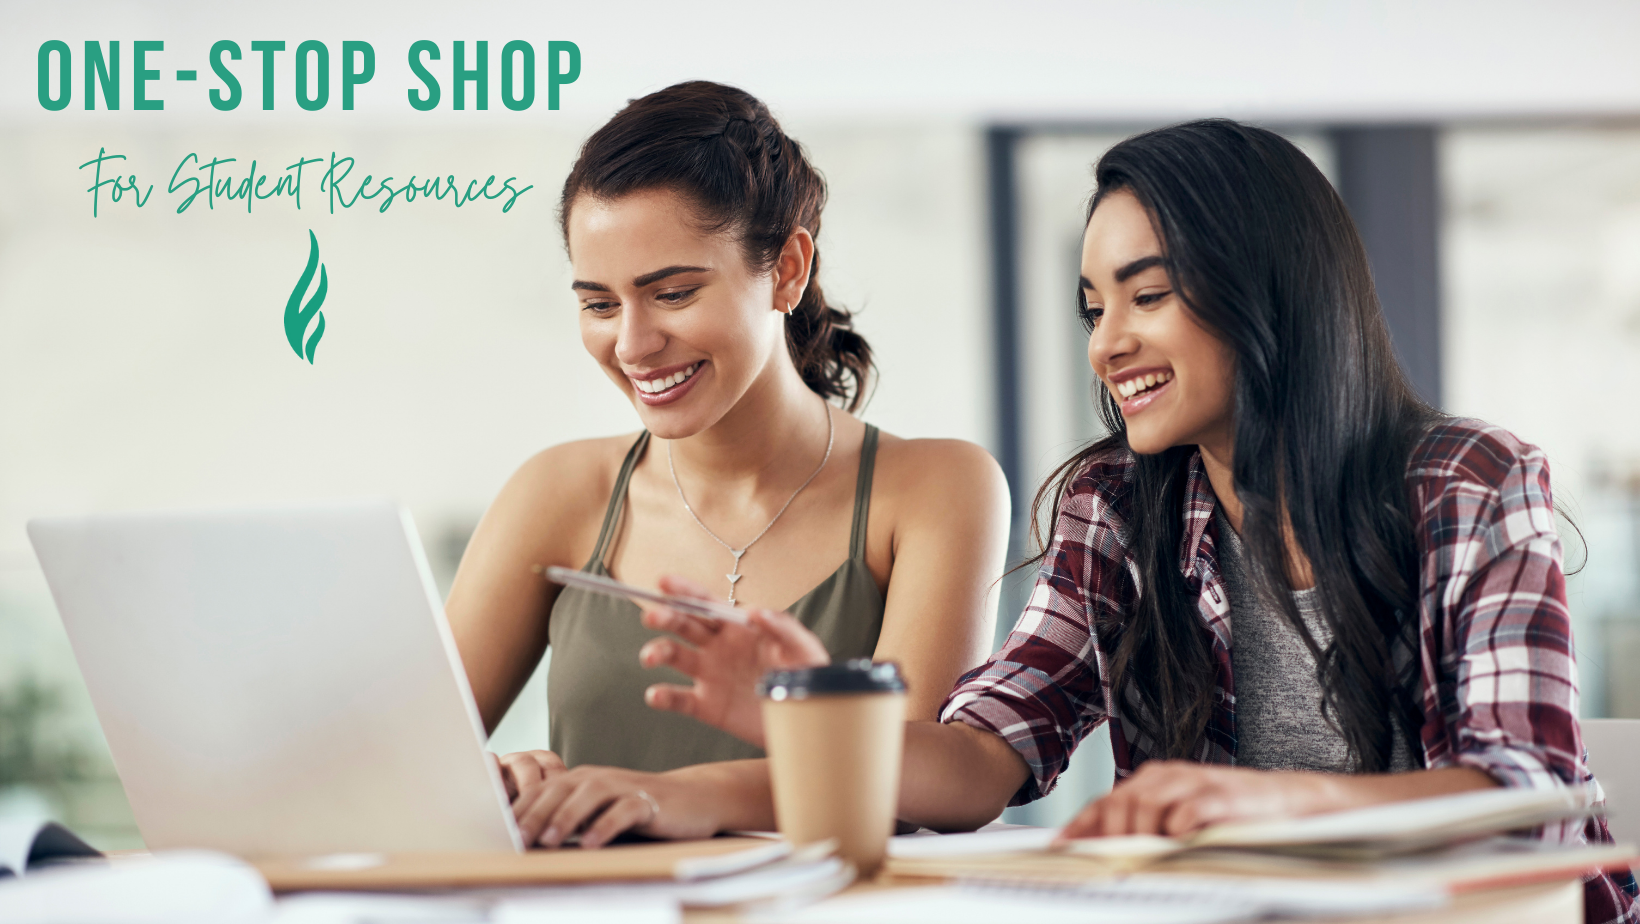 Onestop shop guide